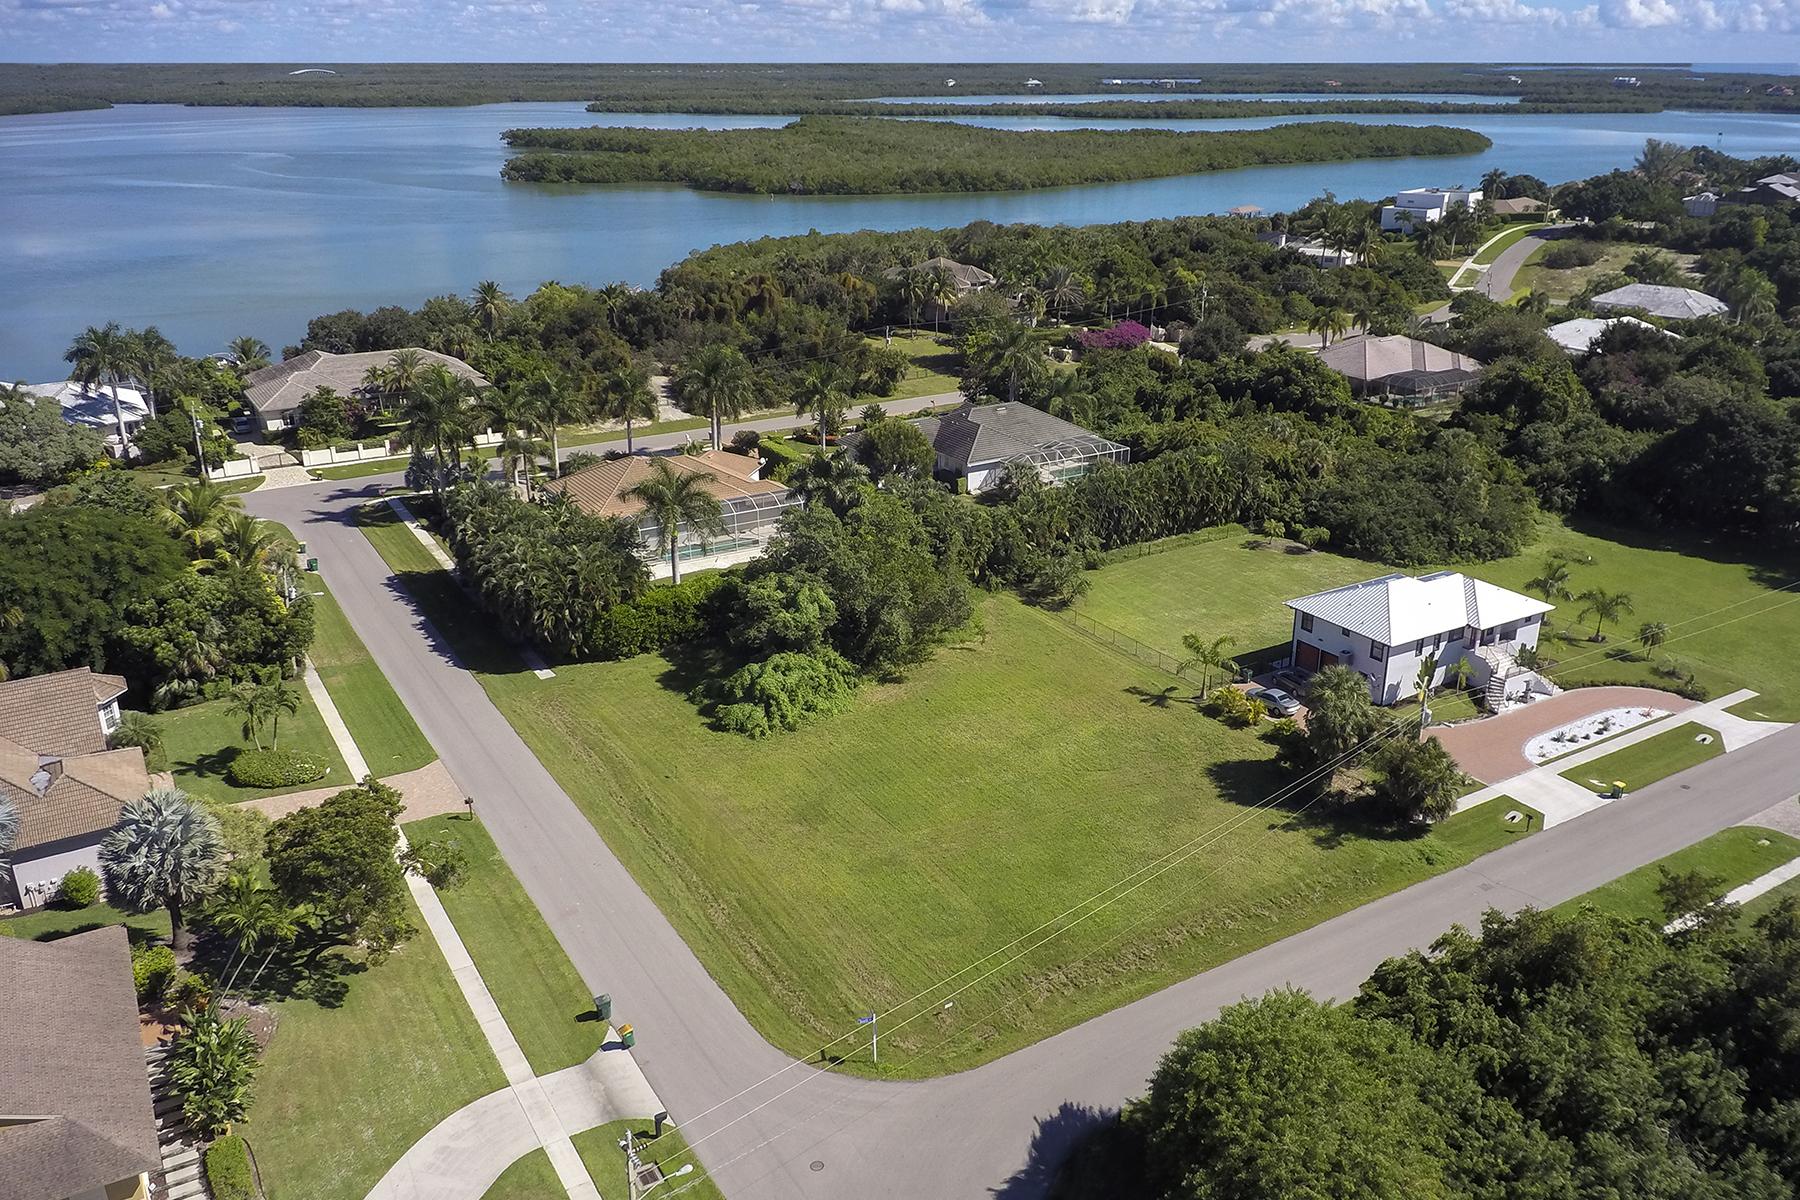 Đất đai vì Bán tại MARCO ISLAND - SCOTT DRIVE 801 Scott Dr Marco Island, Florida, 34145 Hoa Kỳ